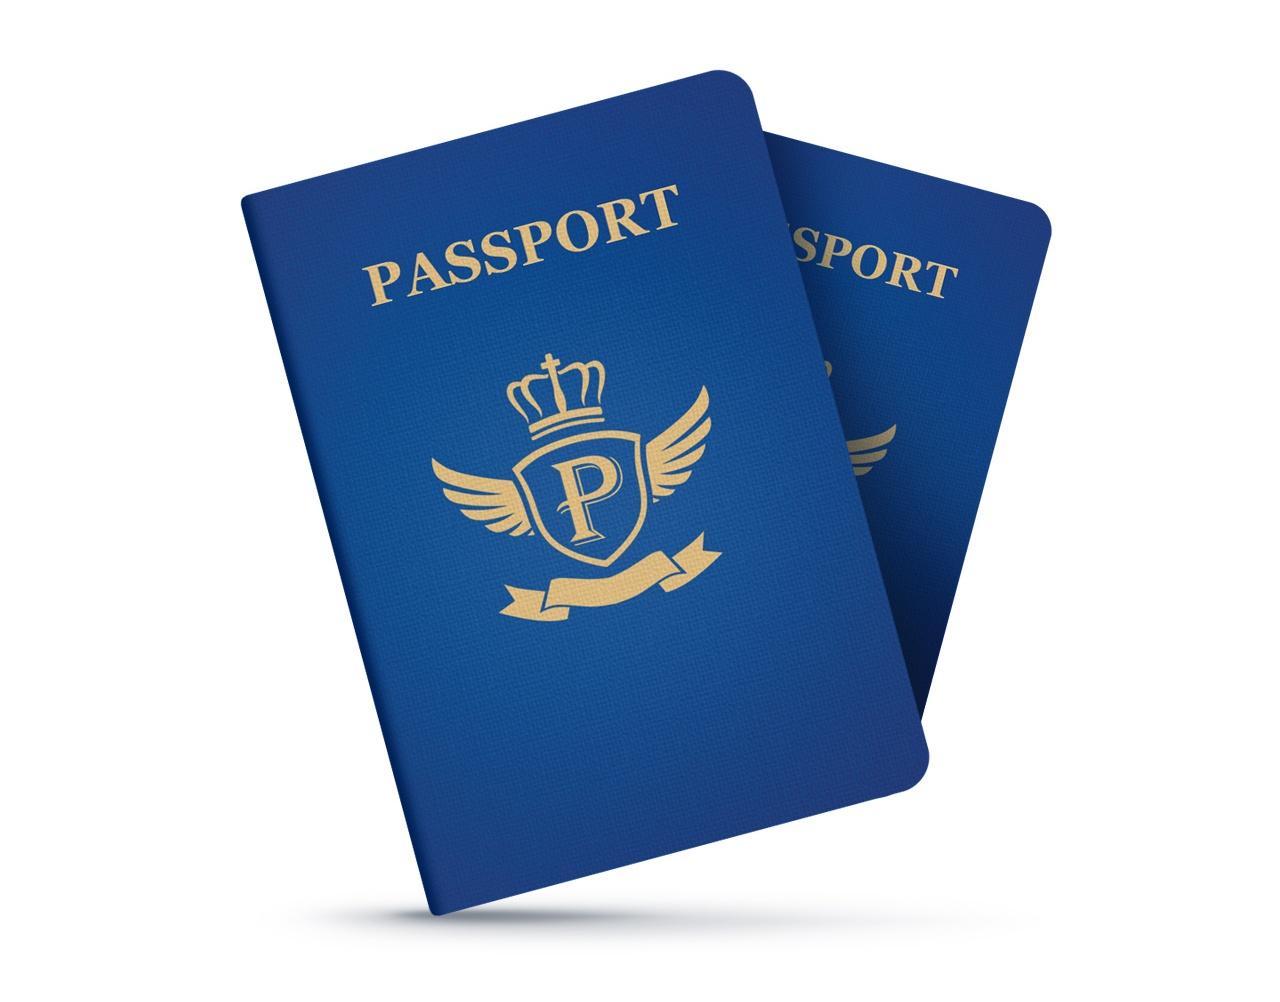 Passport Photo Clipart.